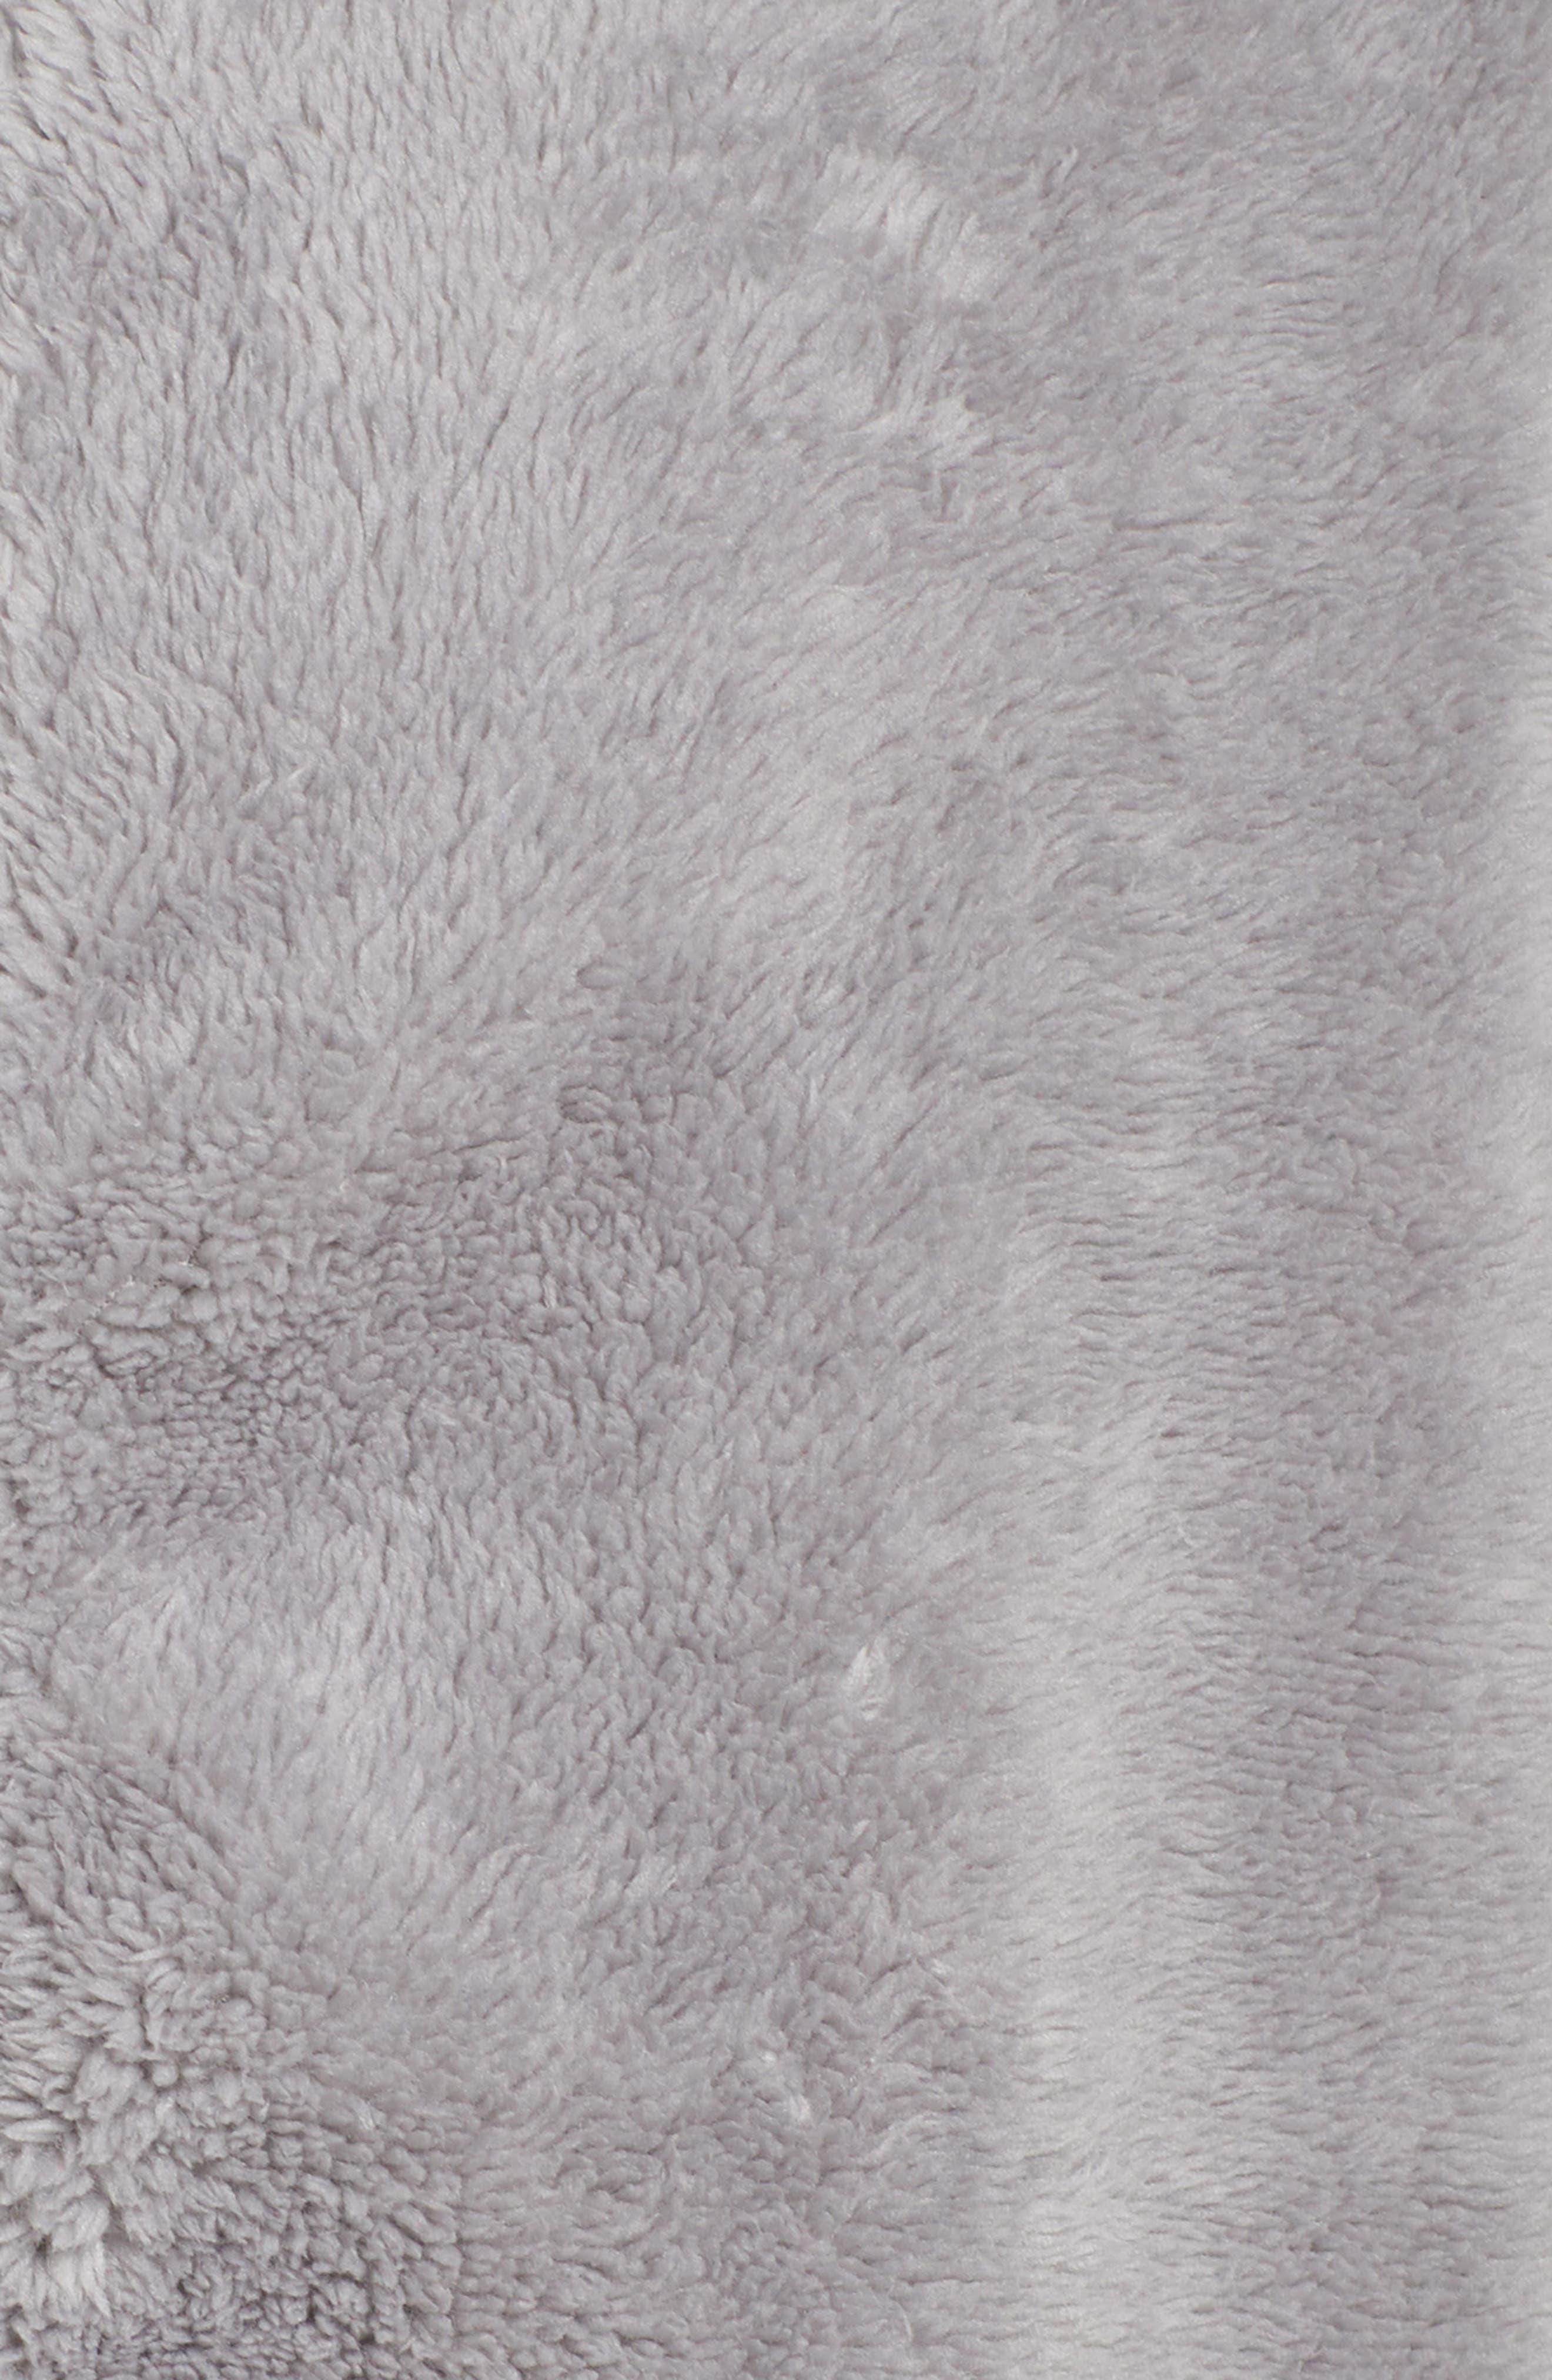 Dazed Fleece Jacket,                             Alternate thumbnail 6, color,                             GREY